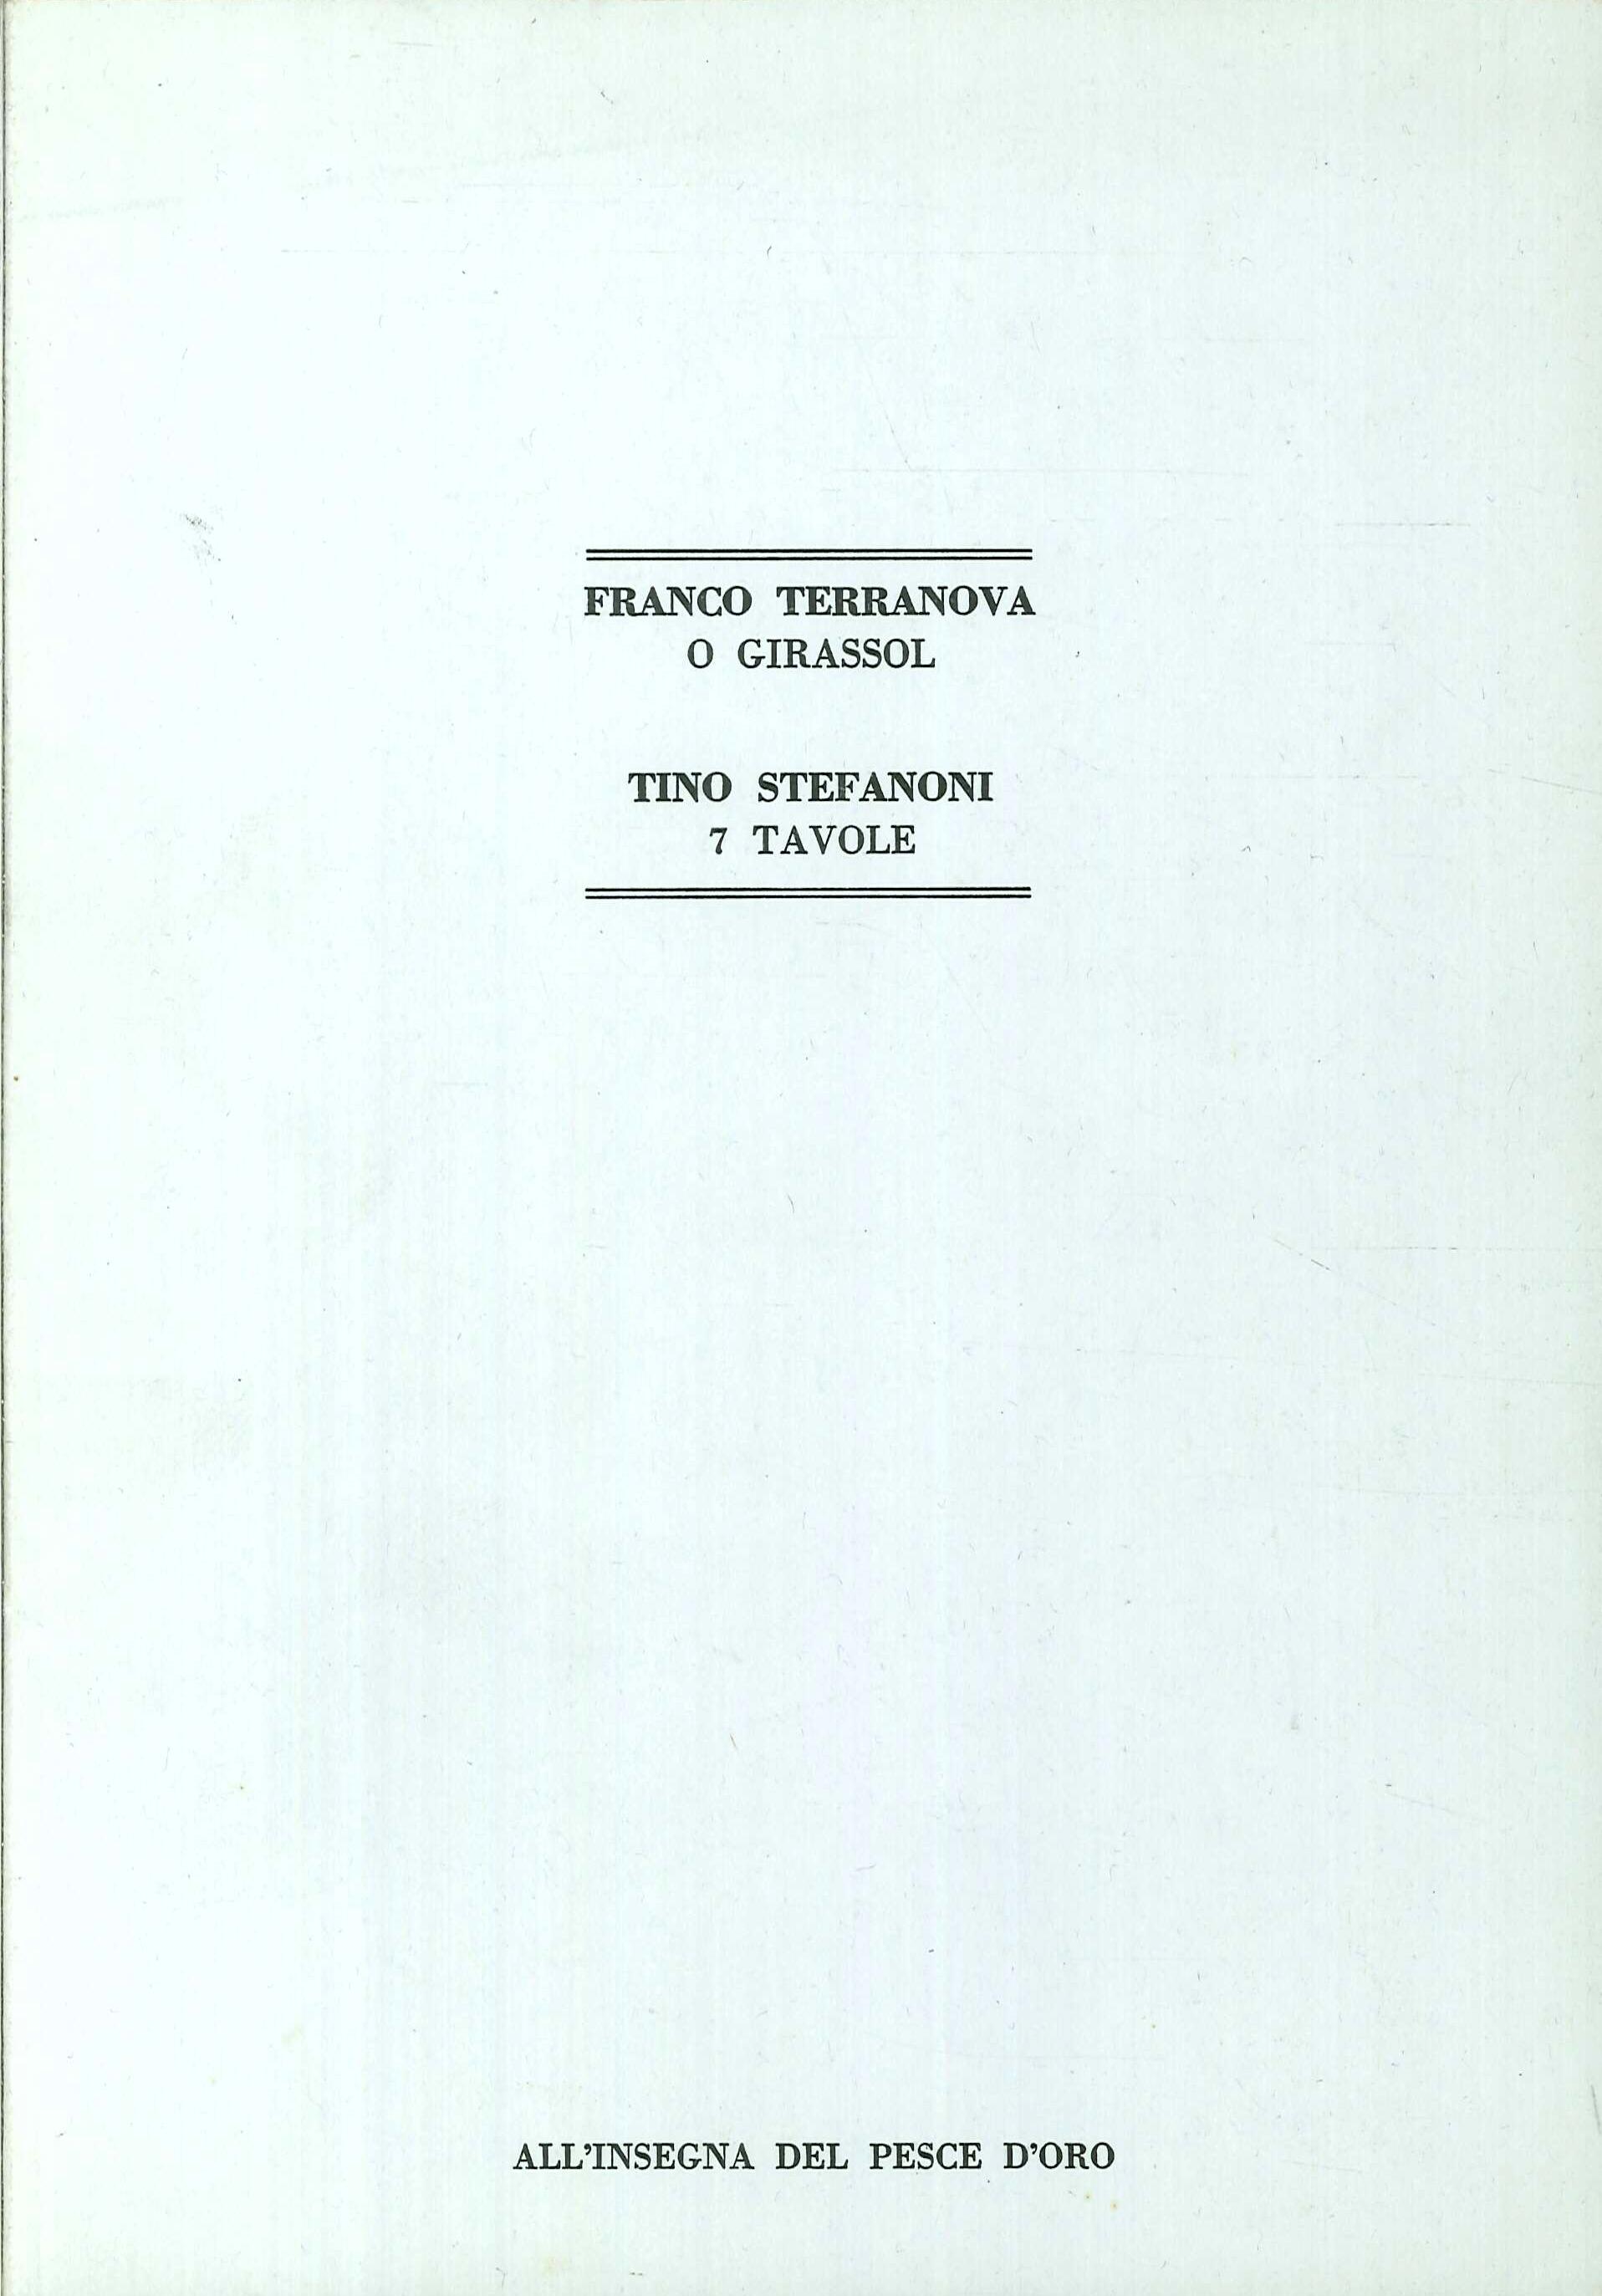 Franco Terranova. 0 Girassol. Tino Stefanoni. 7 Tavole.